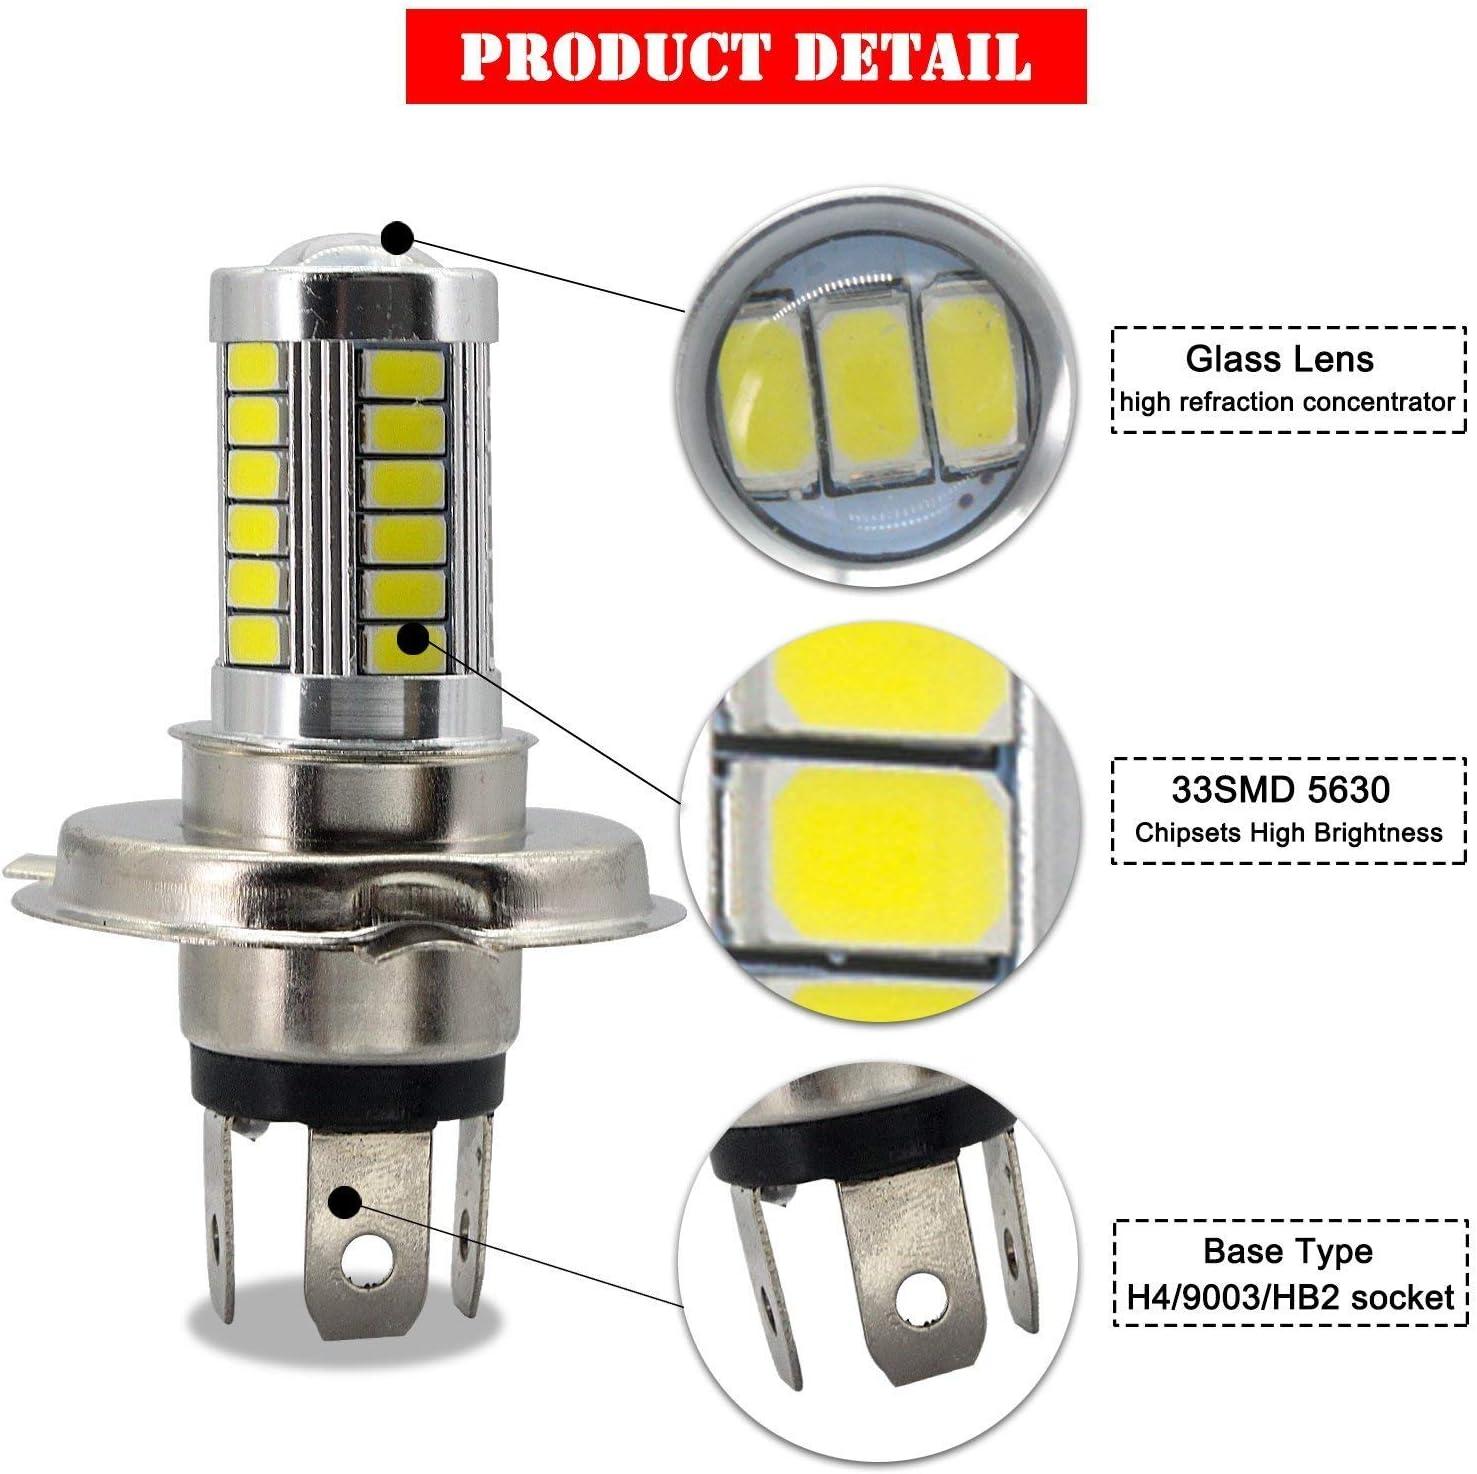 Hot H4 33 SMD 5630 LED 800LM White Car Signal Headlight Auto Fog Light Bulb Gift